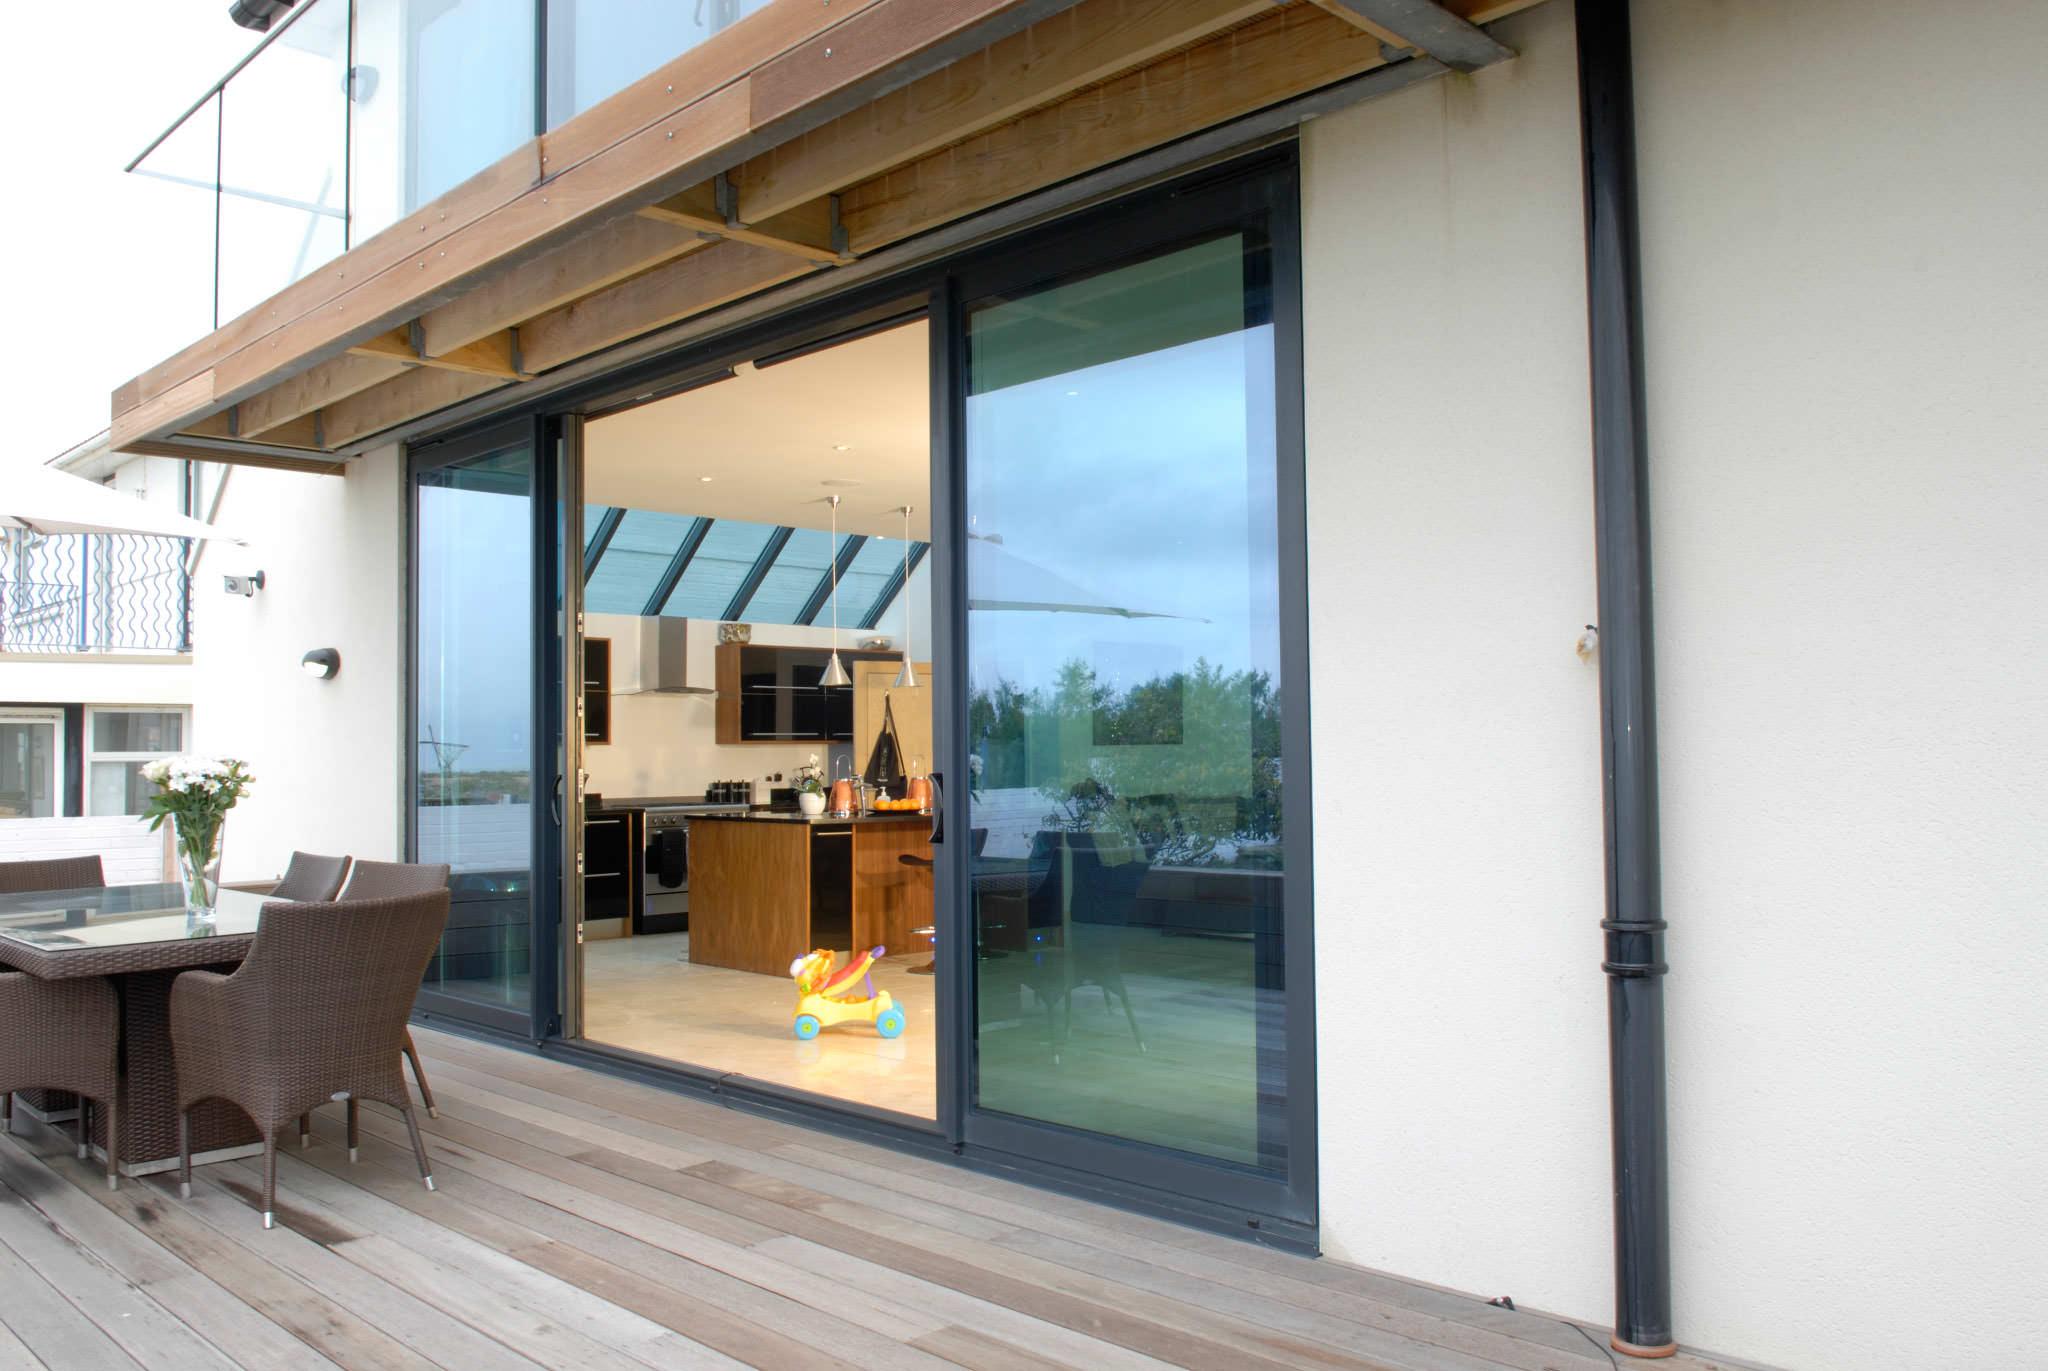 Aluminium Patio Doors Sliding Patio Doors Smarts Visoglide Aluminium